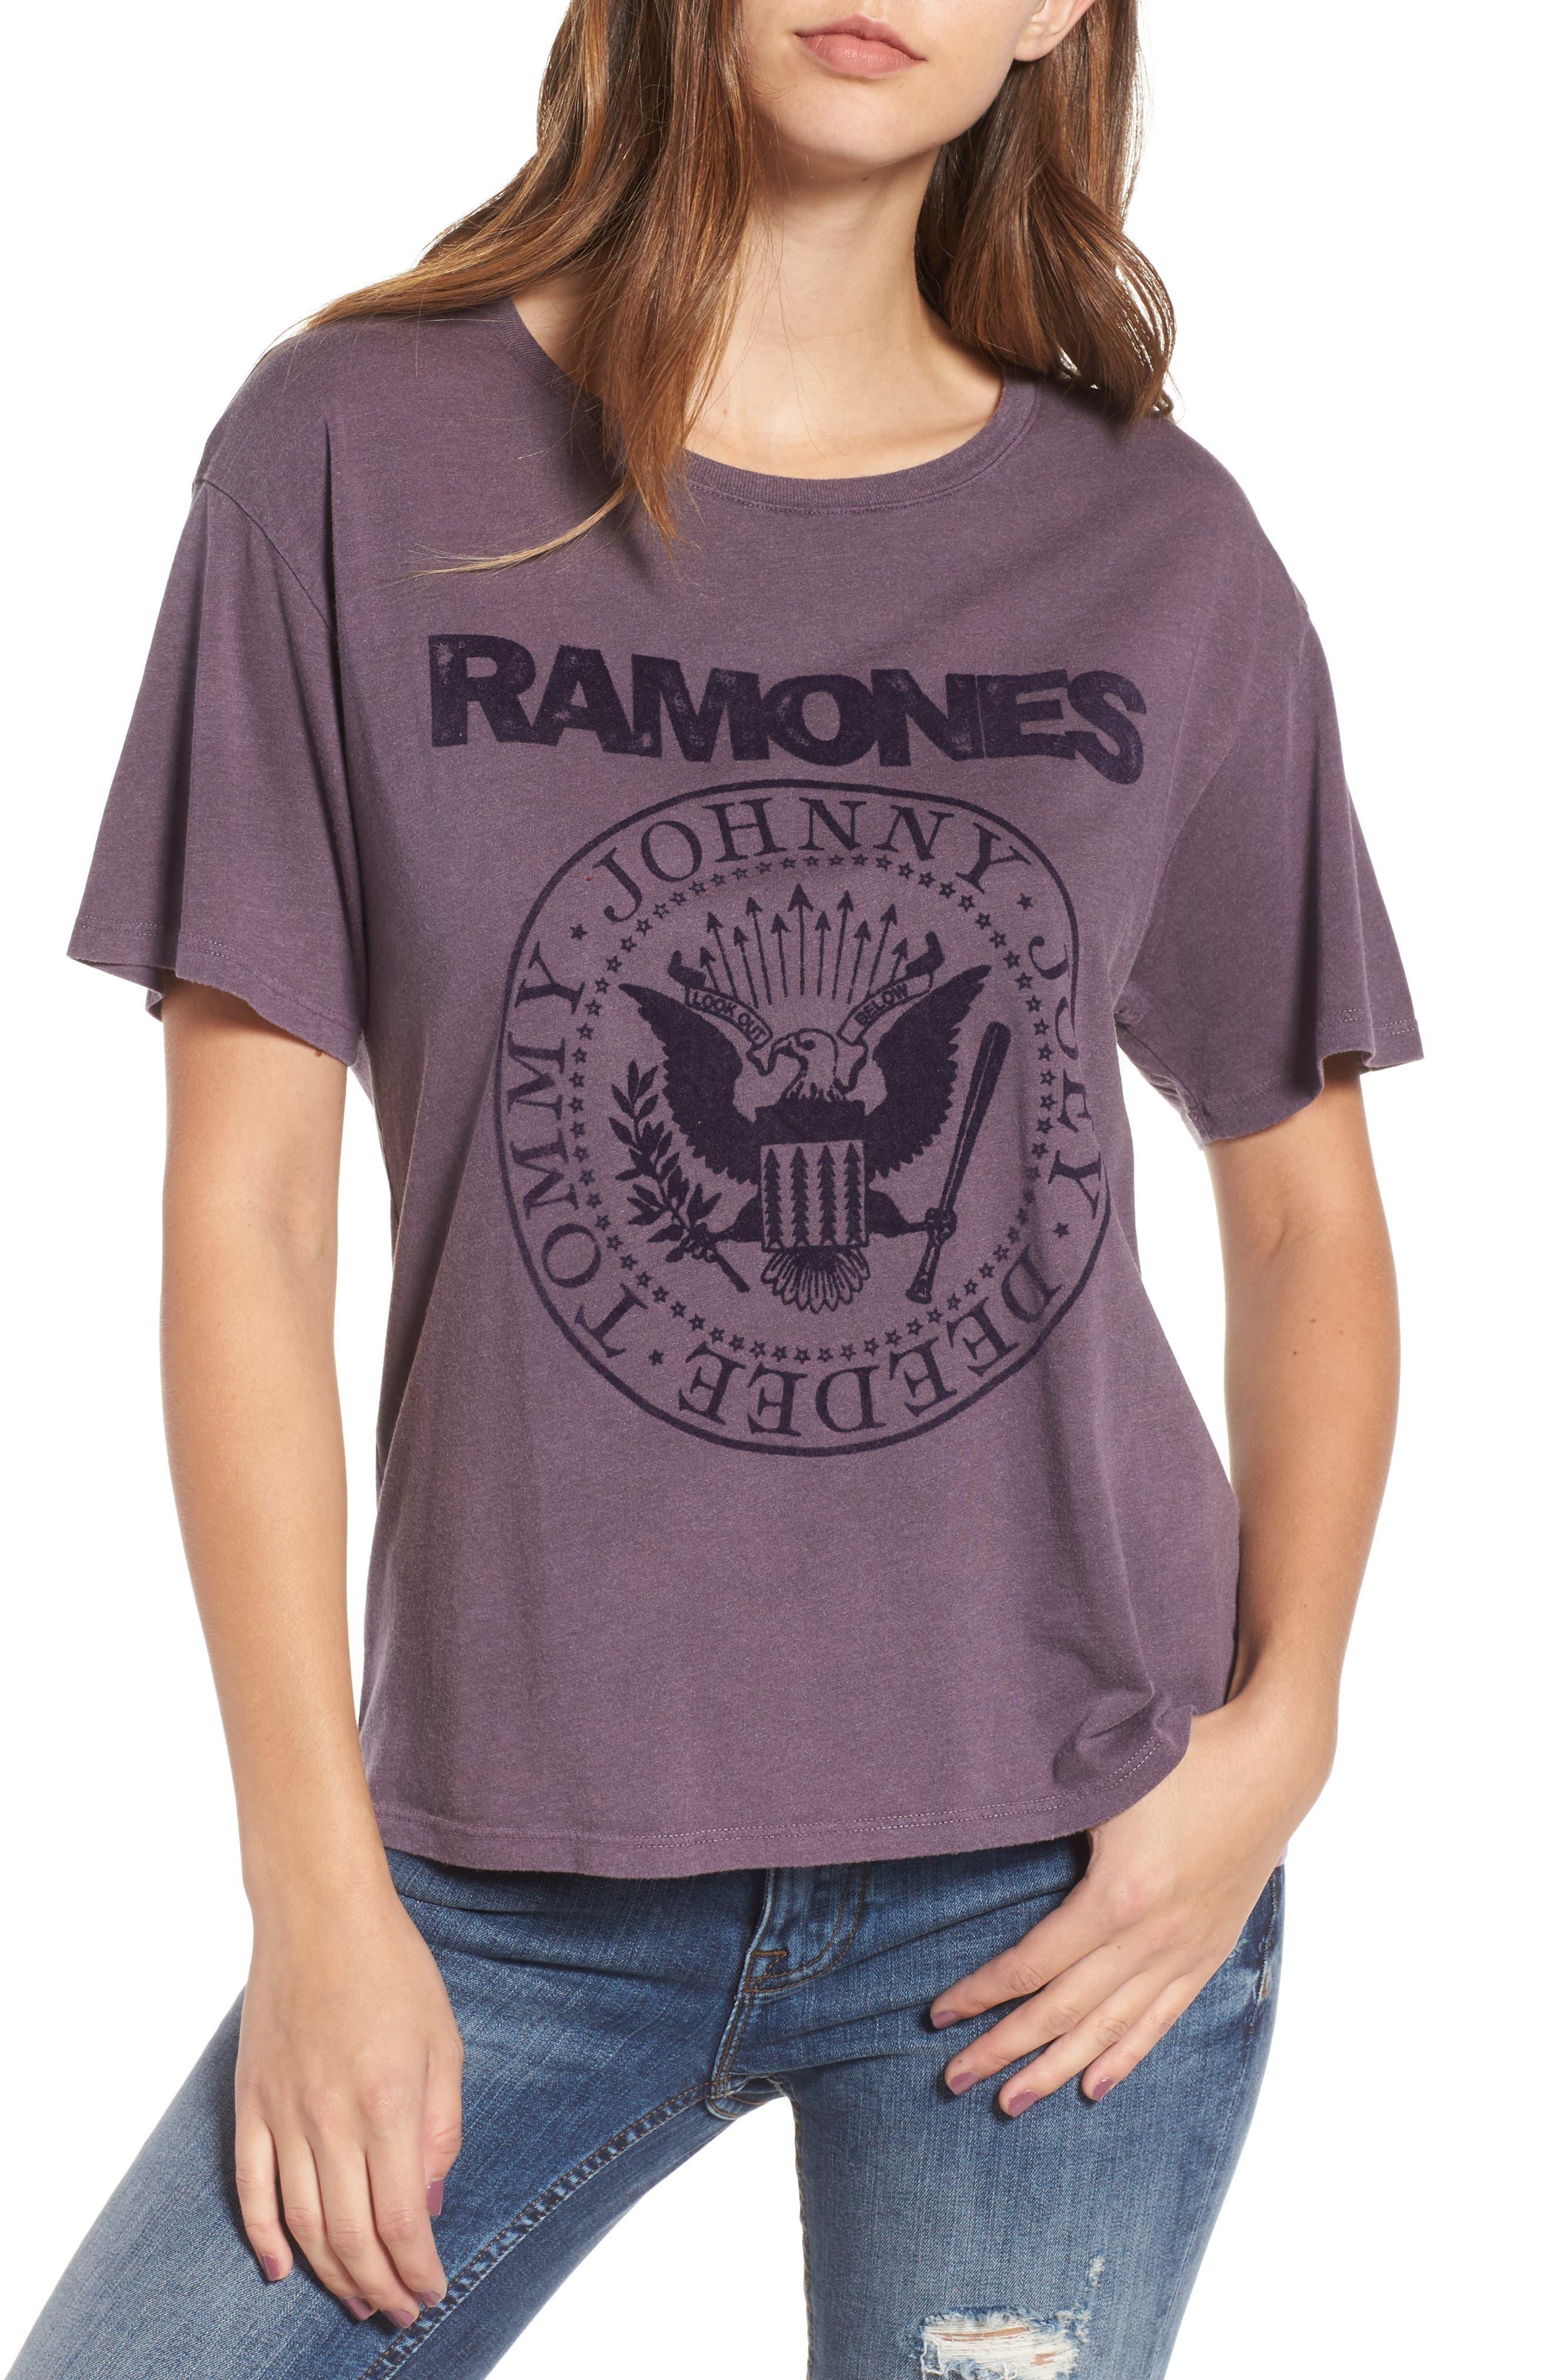 Ramones Tee,                         Main,                         color,